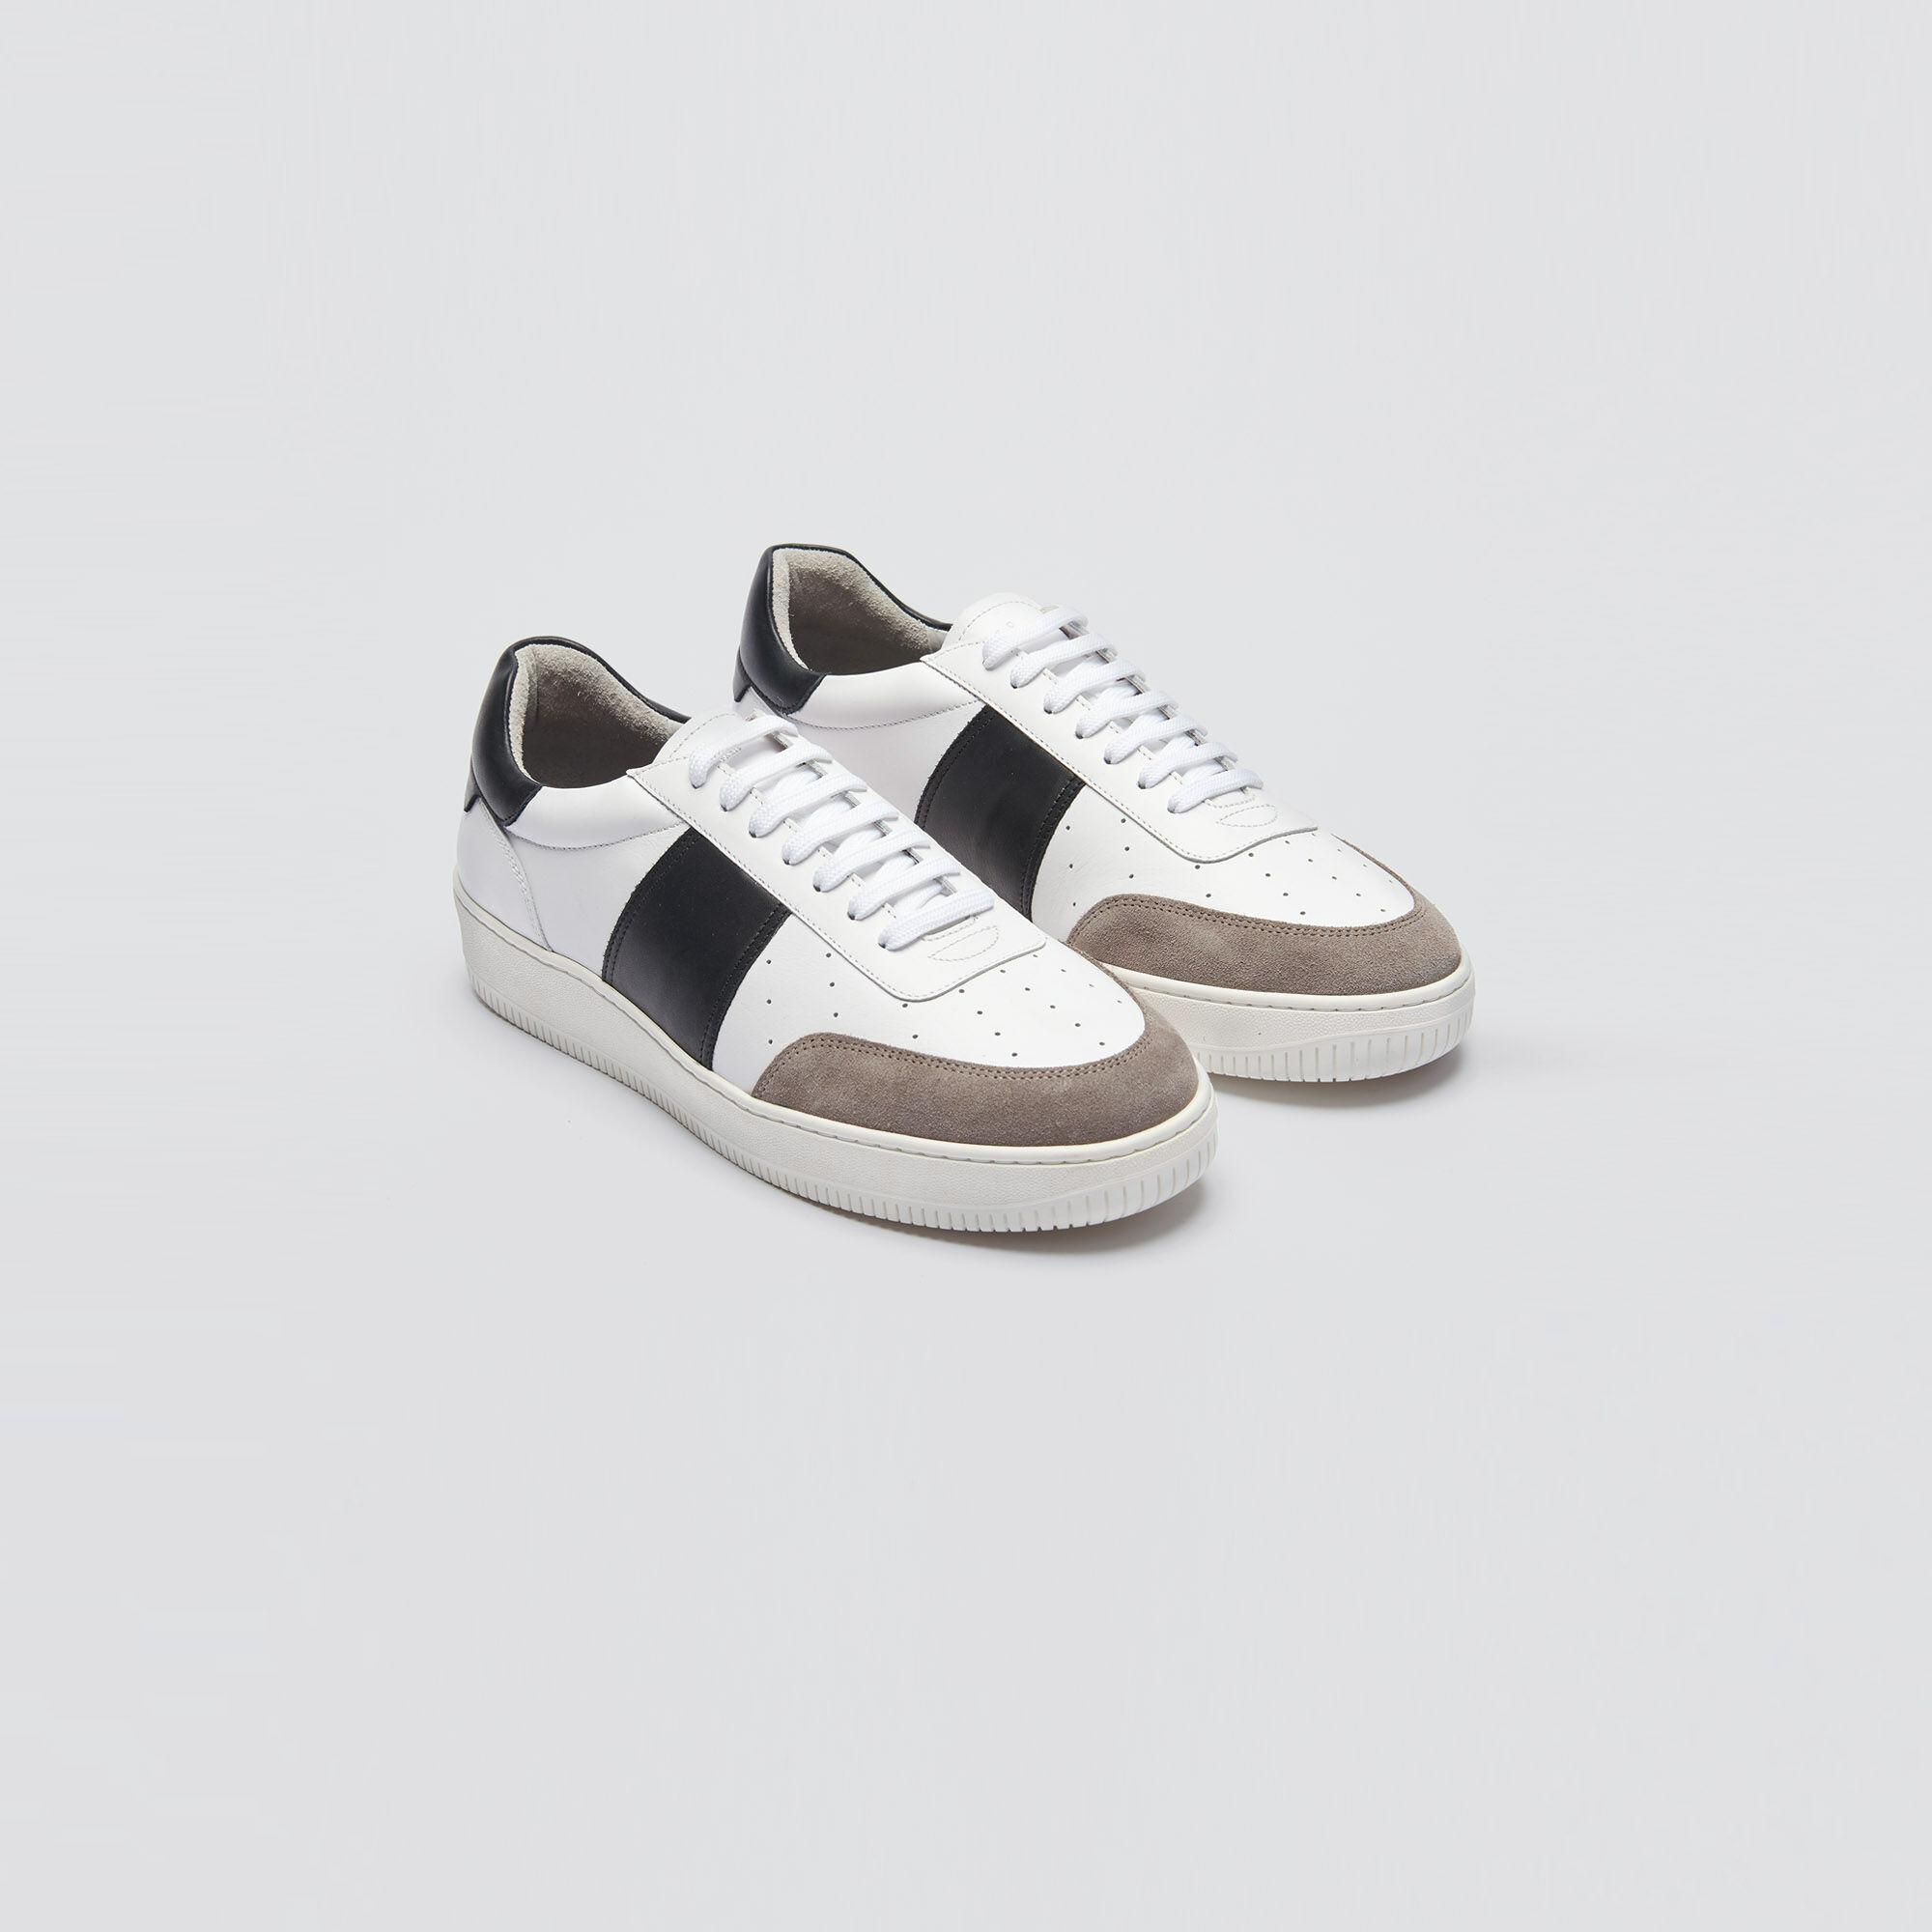 Leather sneakers - Shoes   Sandro Paris